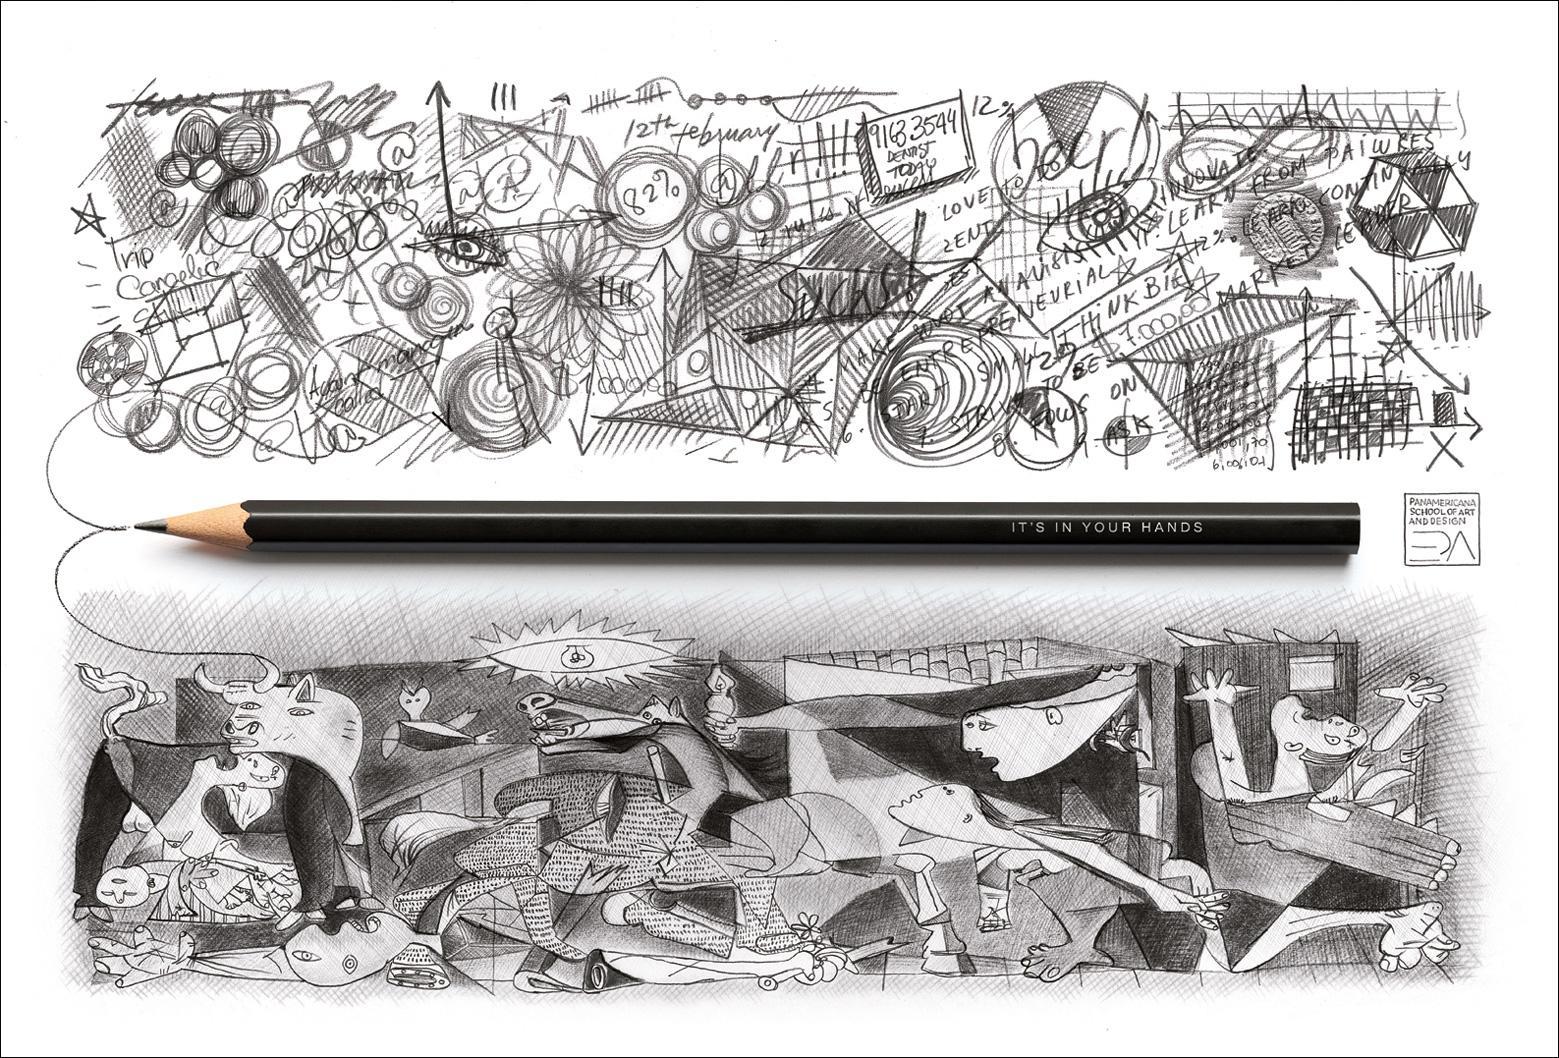 Panamericana School of Art and Design Print Ad -  Pencil